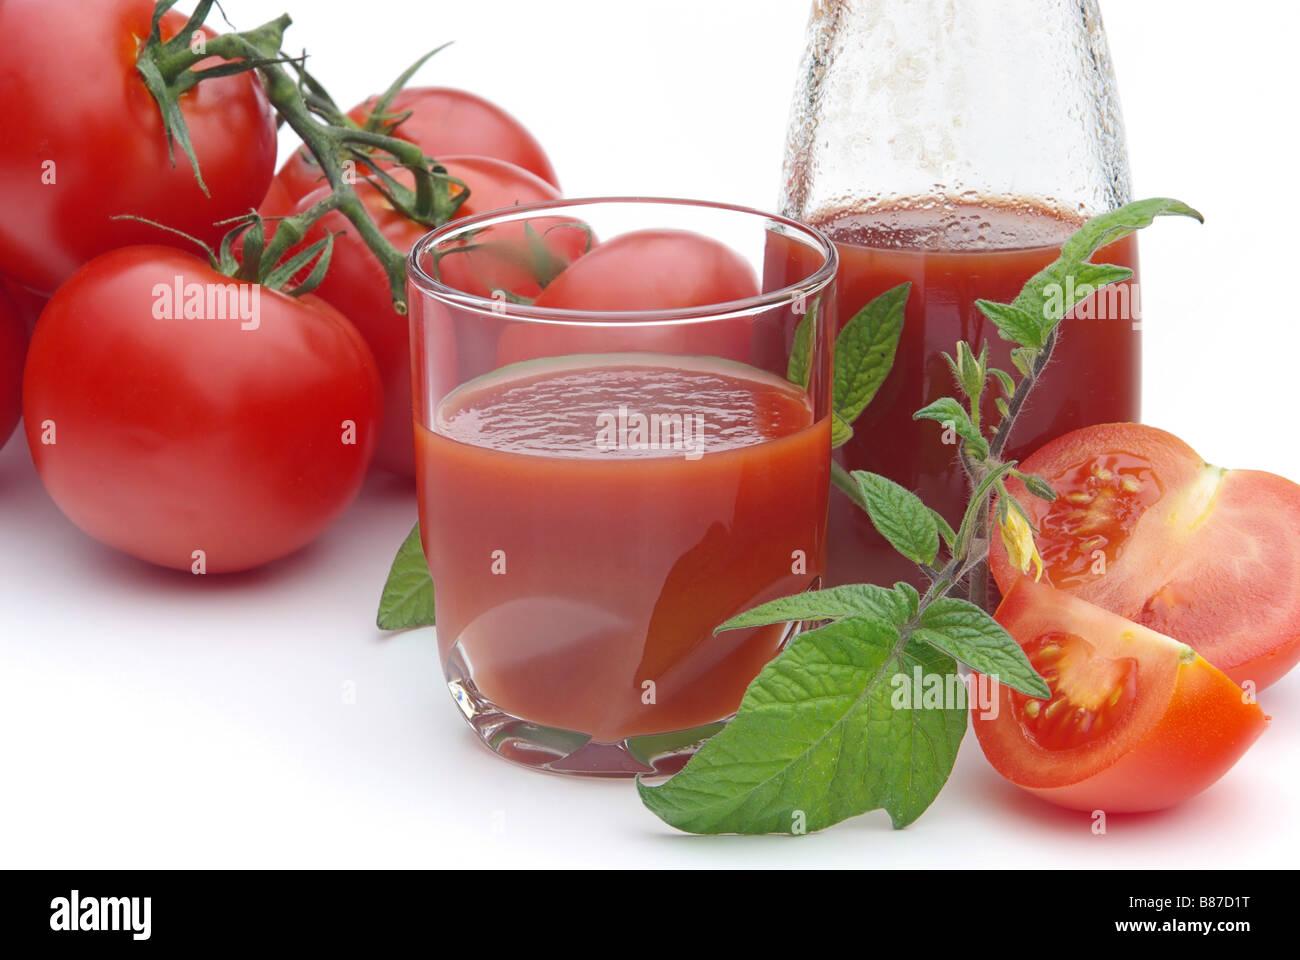 Tomatensaft tomato juice 07 - Stock Image